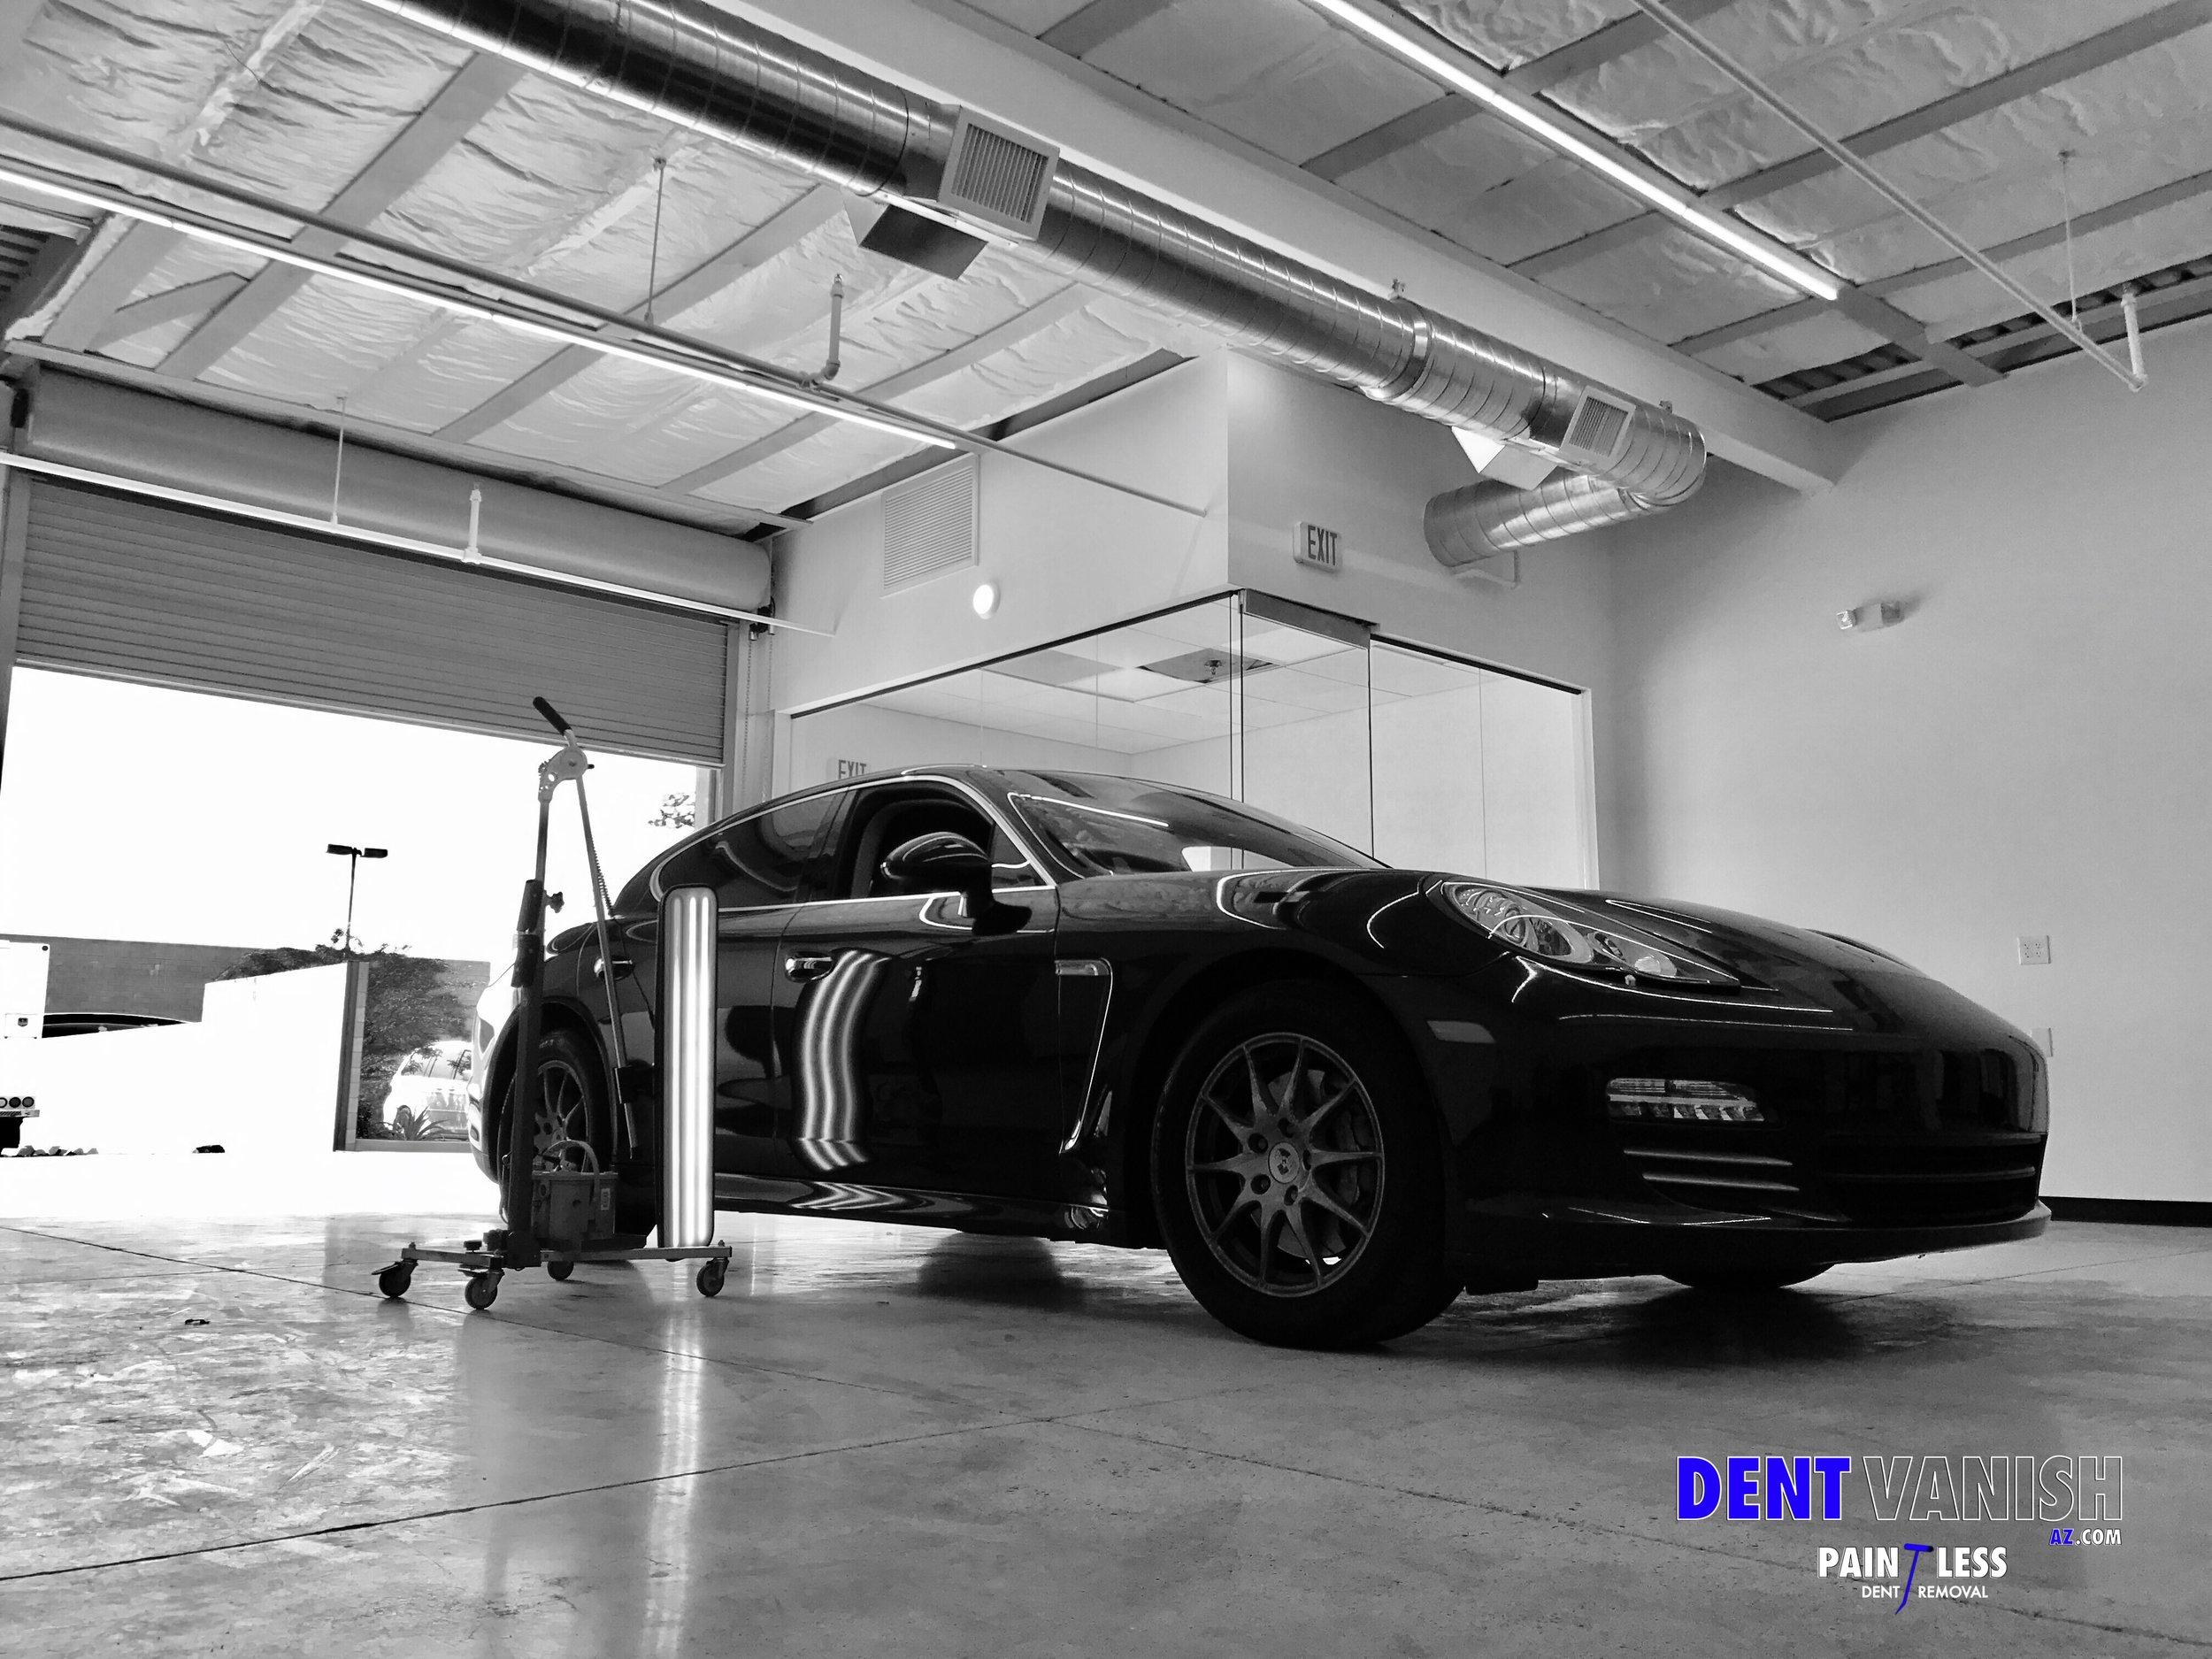 Porsche Panamera ding repair